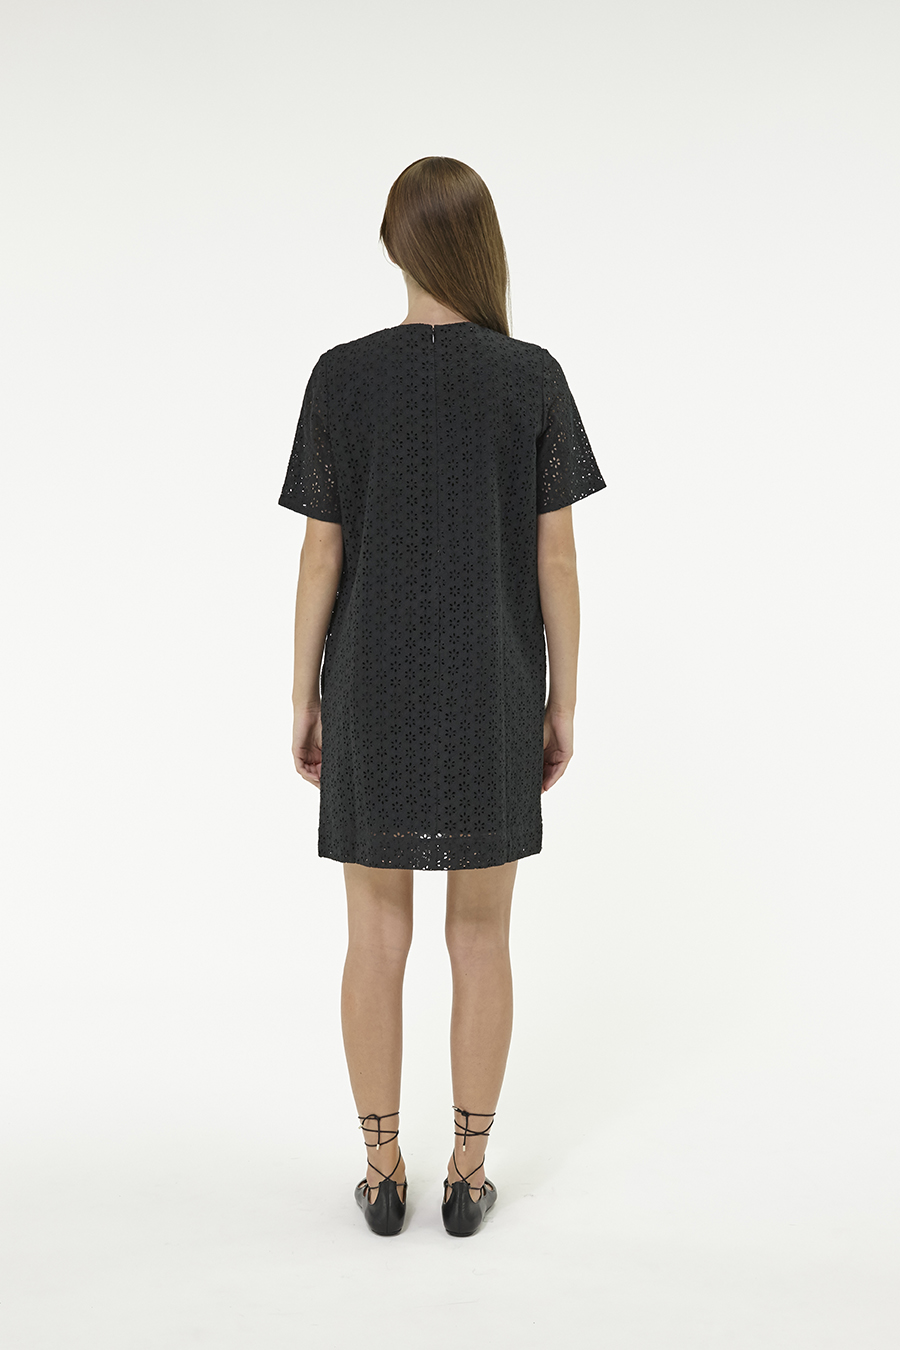 Huffer_Q3-16_W-Hope-Shell-Dress_Black-03